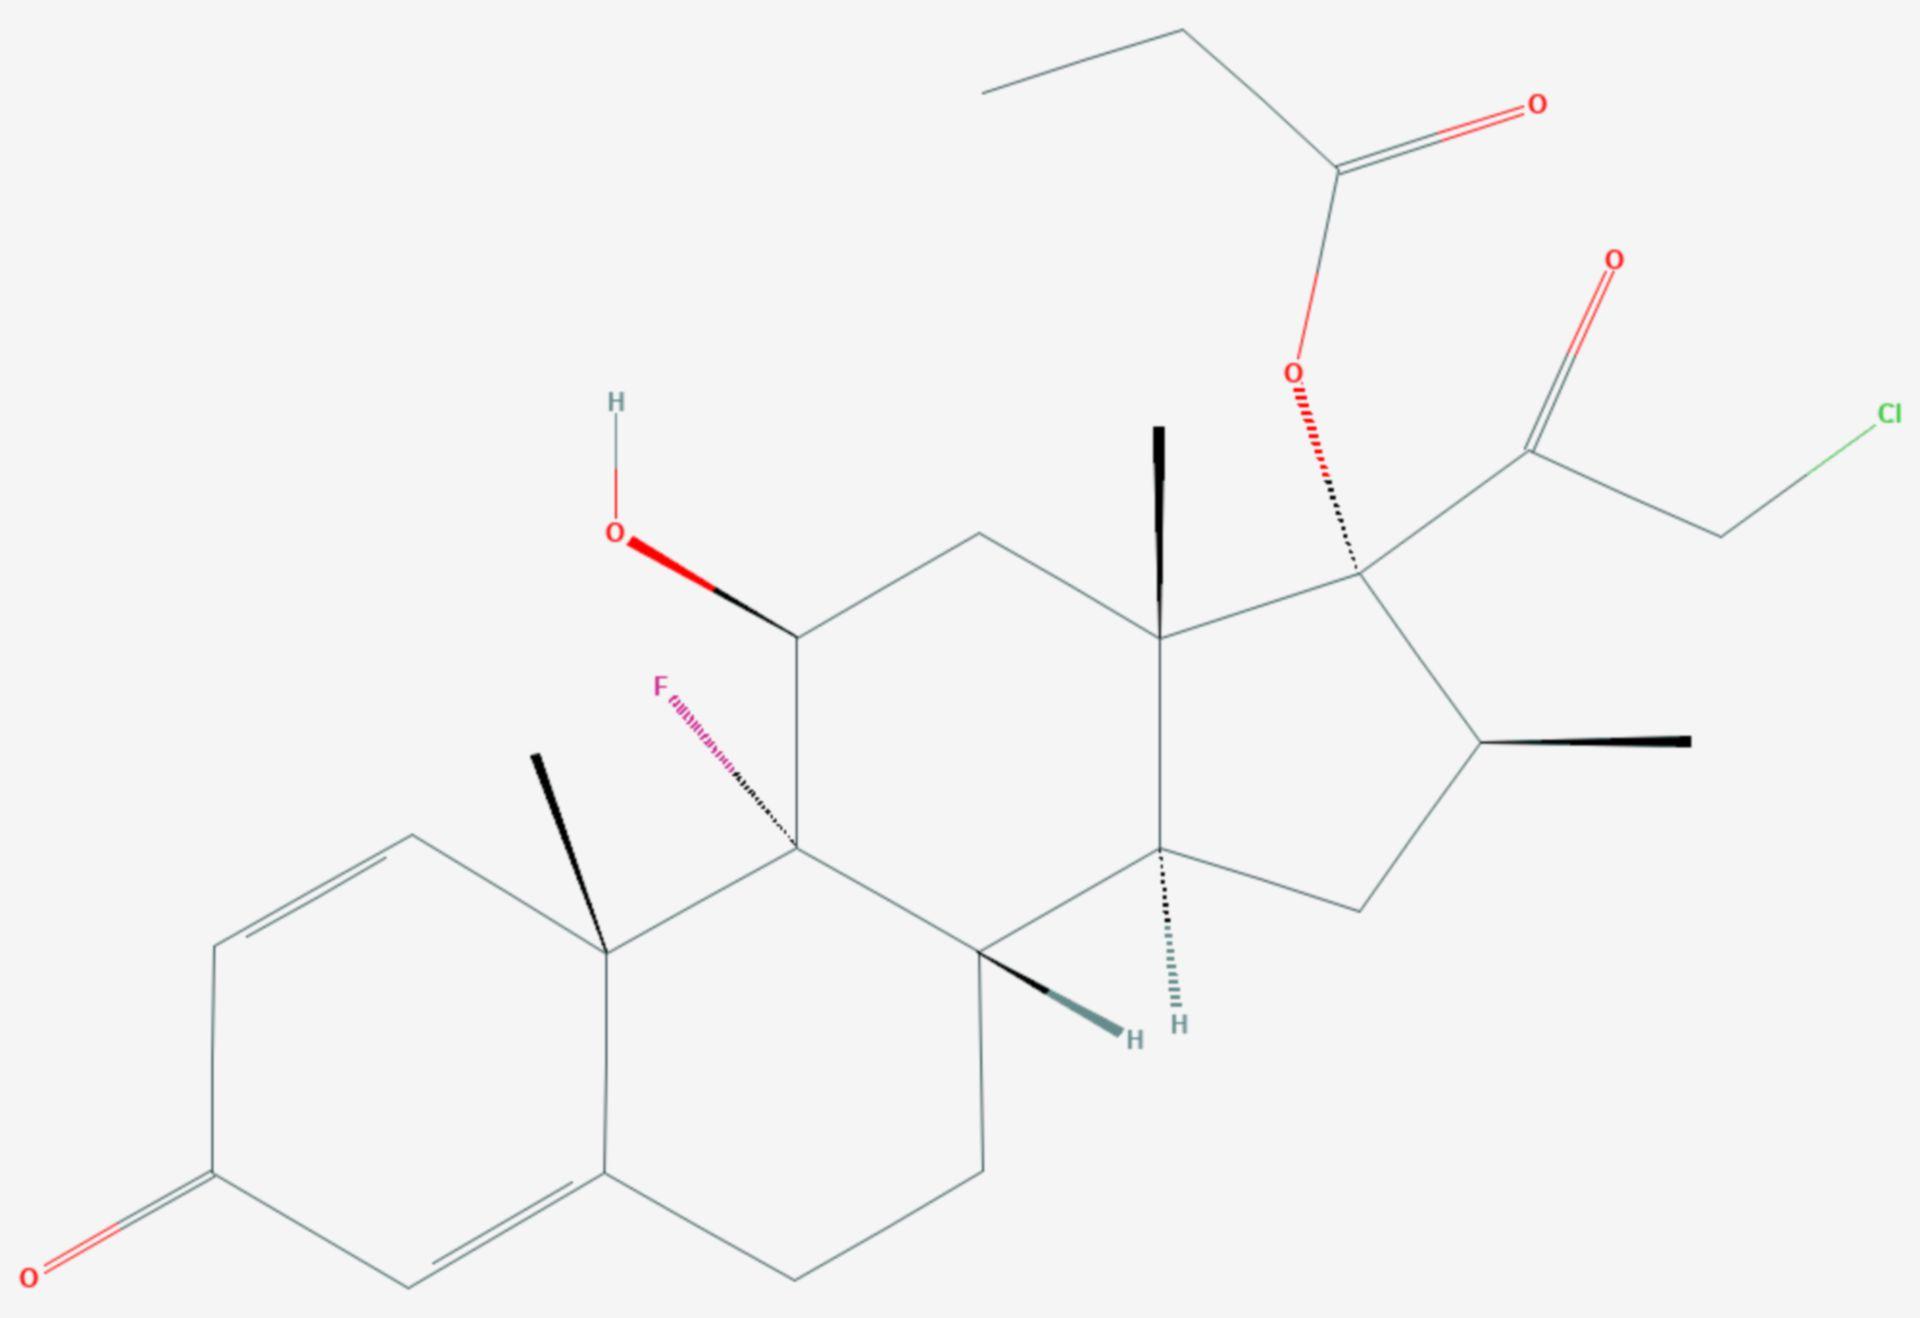 Clobetasolpropionat (Strukturformel)